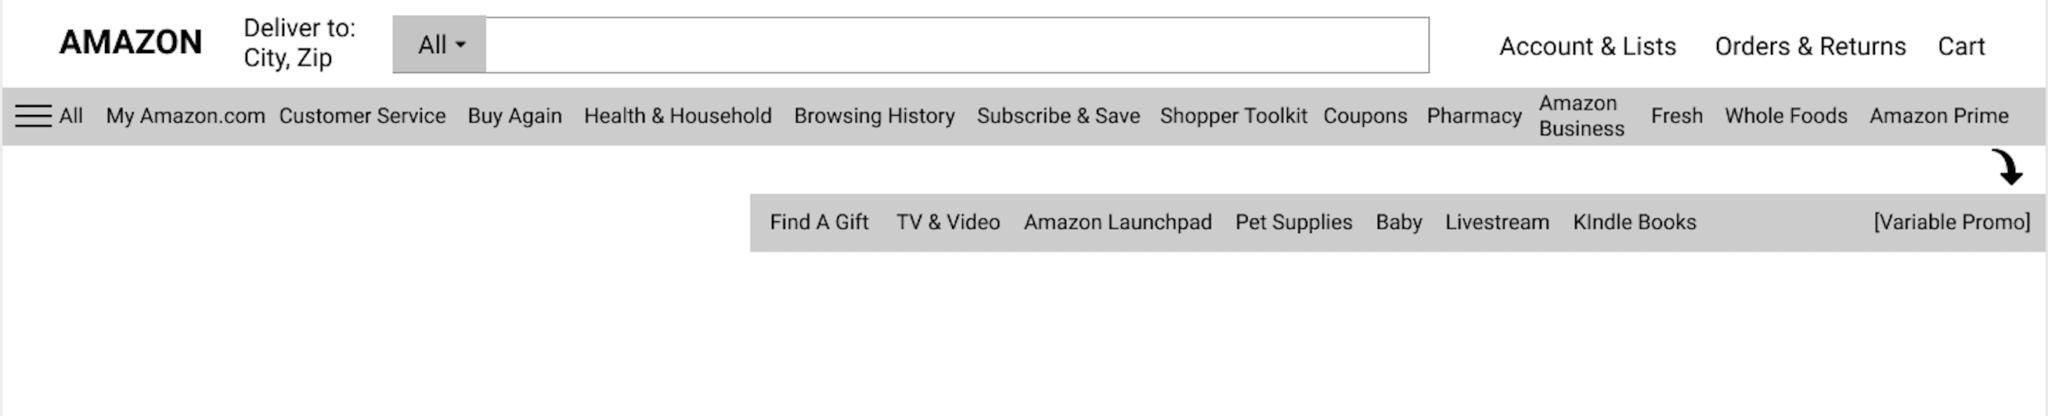 Amazon Navbar - bloated and repetitive menu